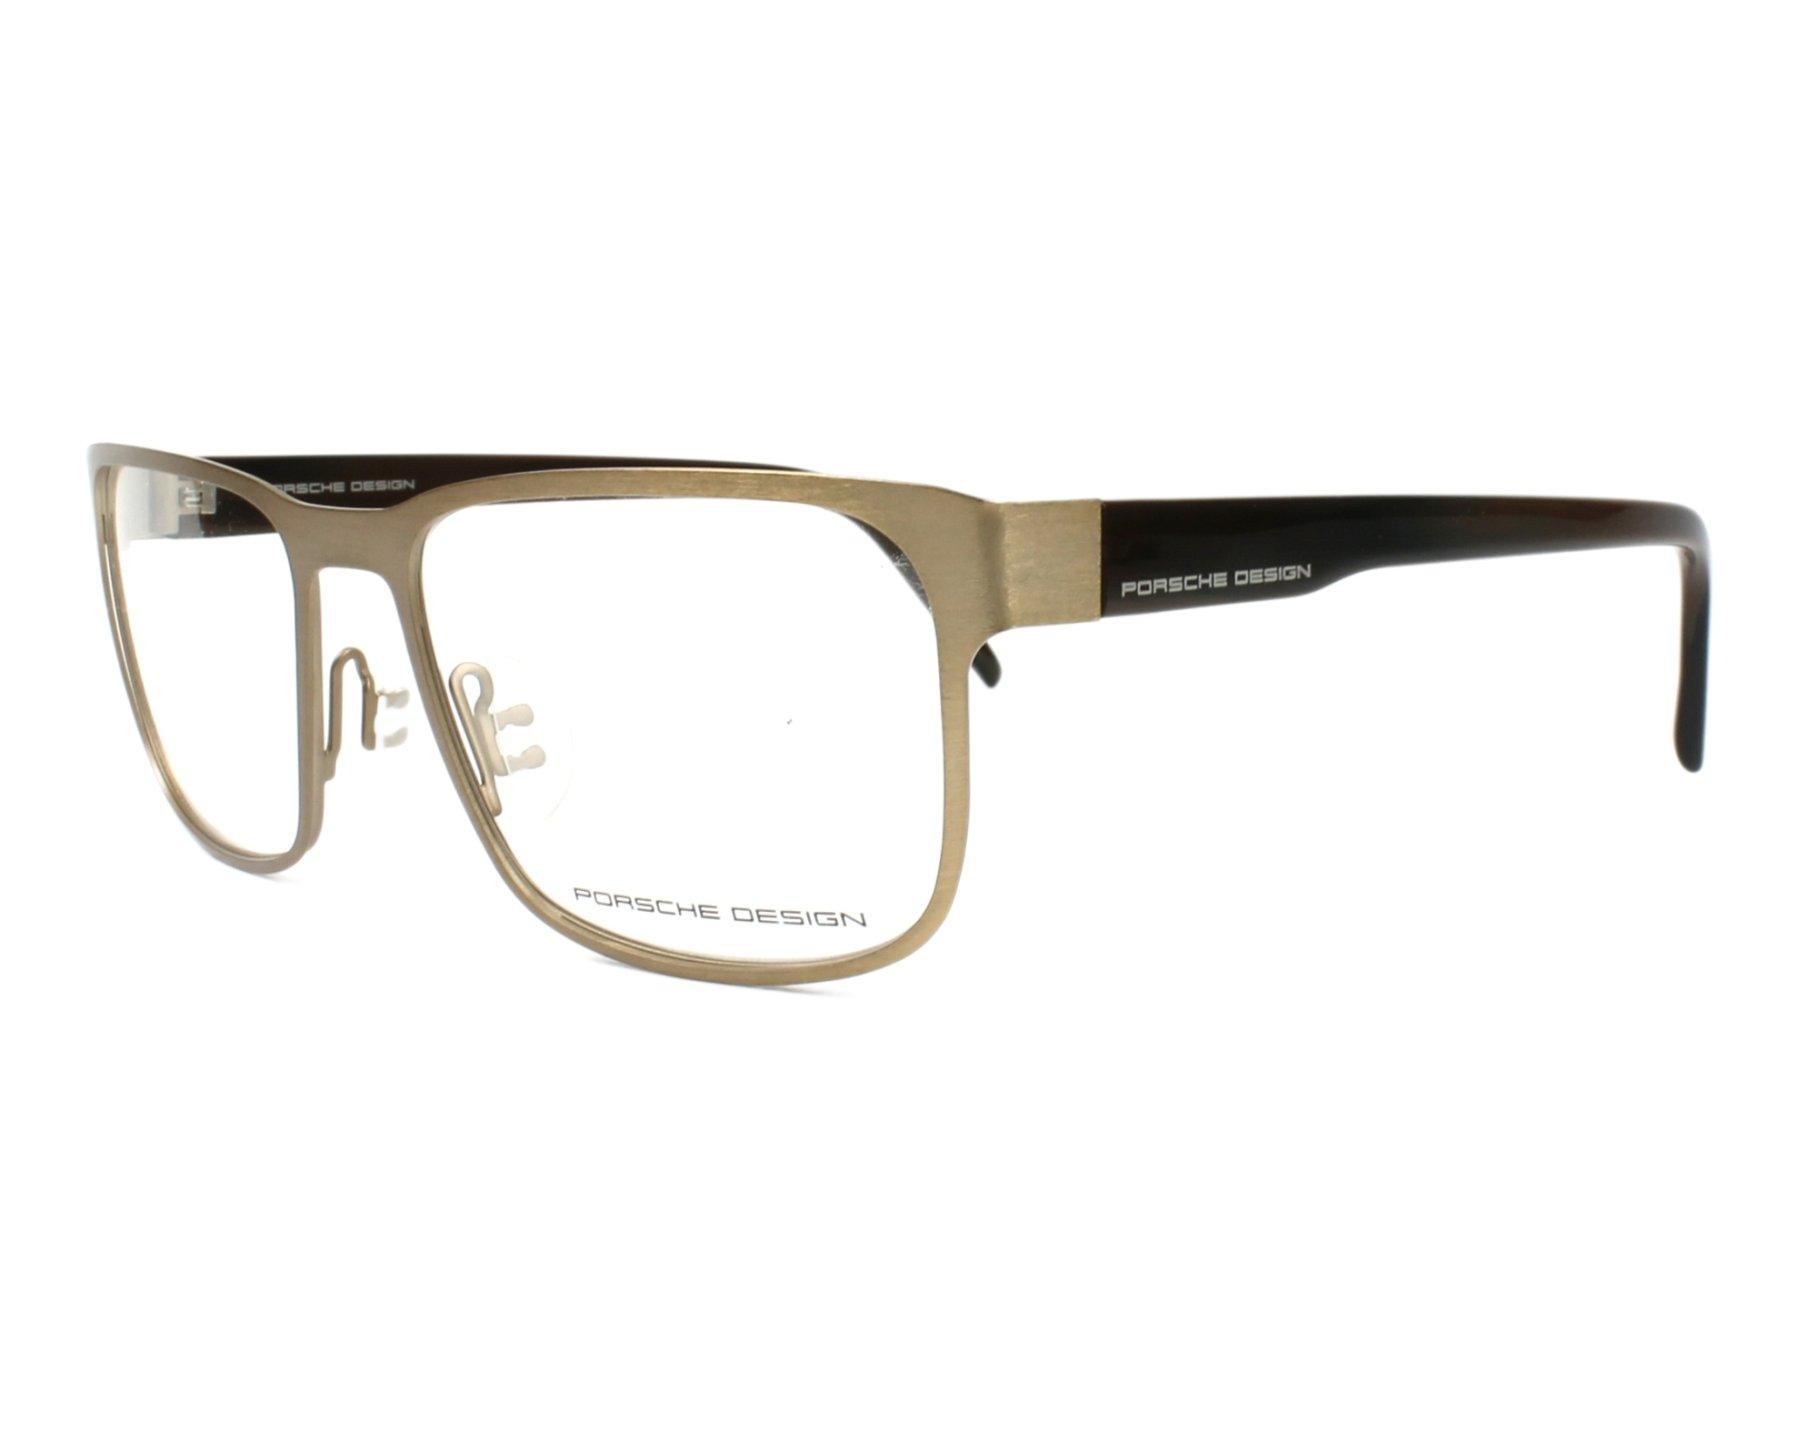 3ad6b605db6 eyeglasses Porsche Design P-8291 D 55-18 Gold Brown profile view